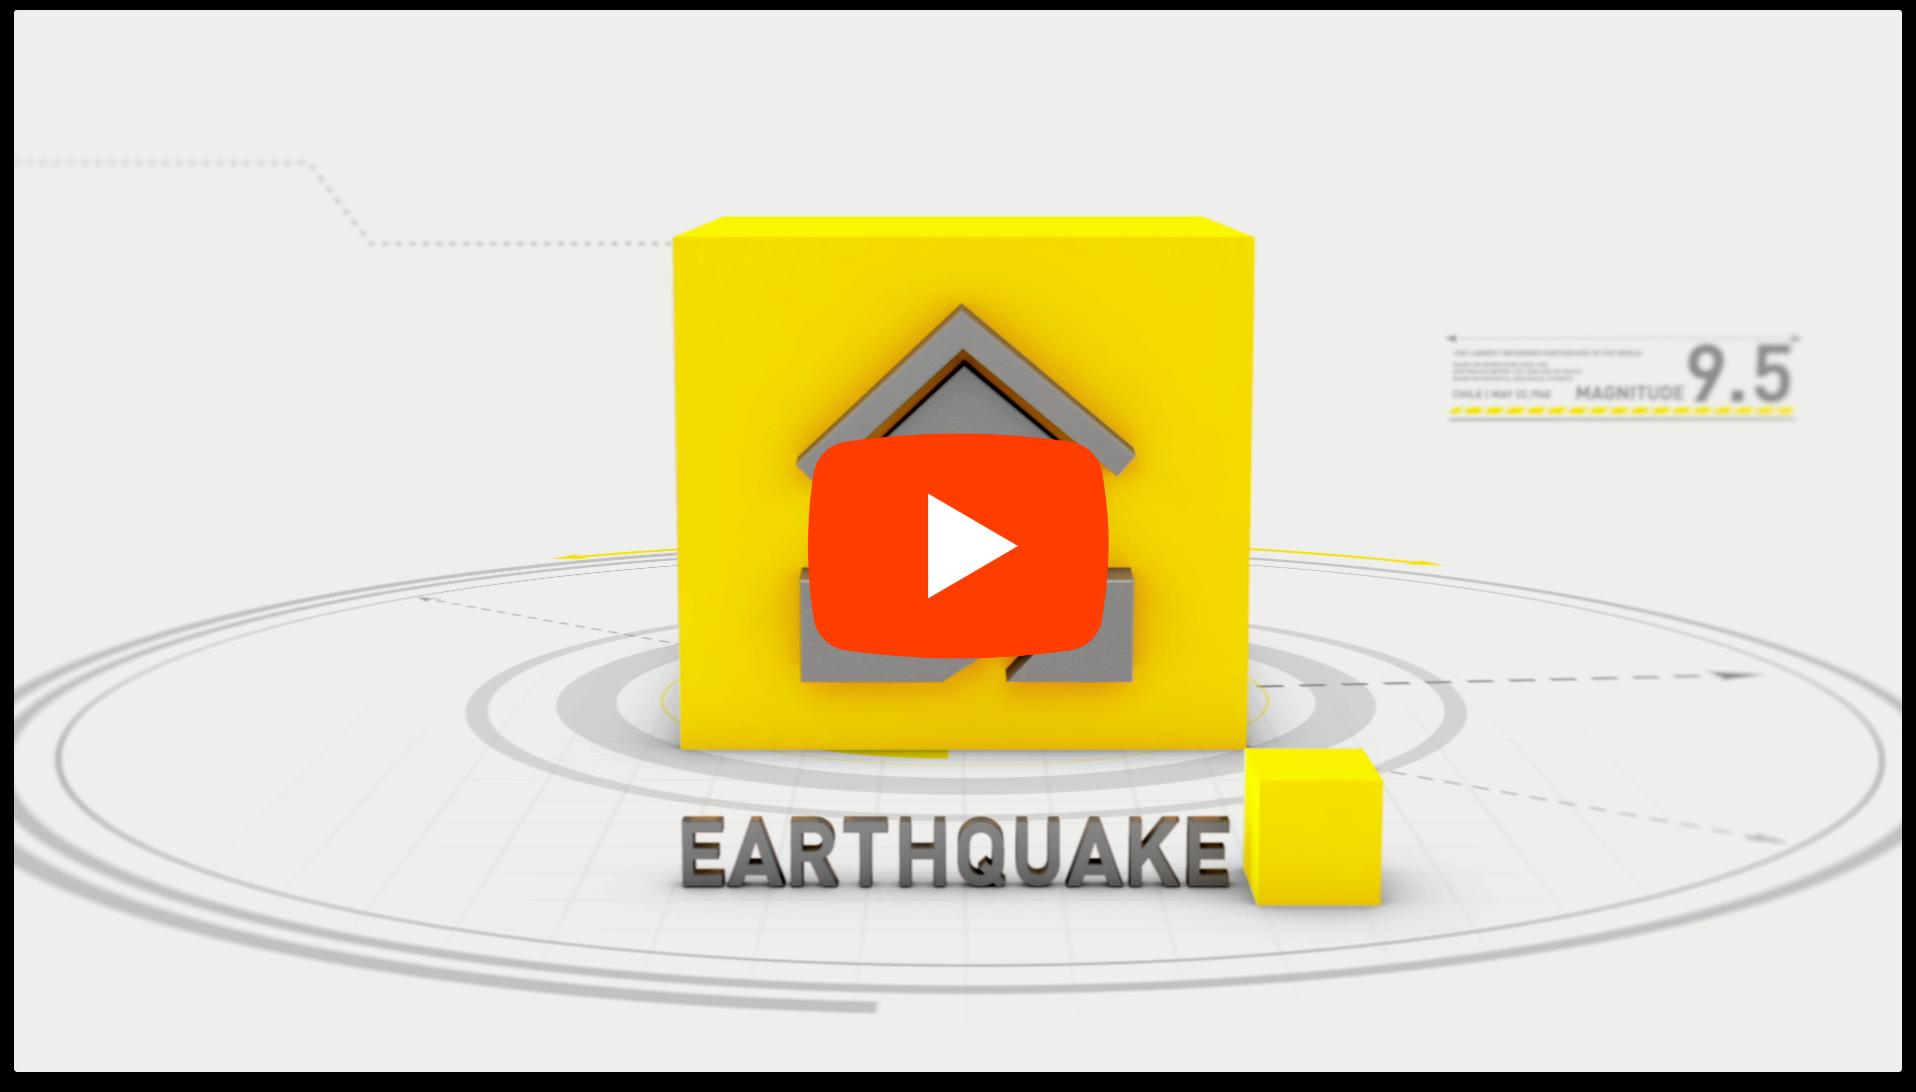 <p>แผ่นดินไหว</p>